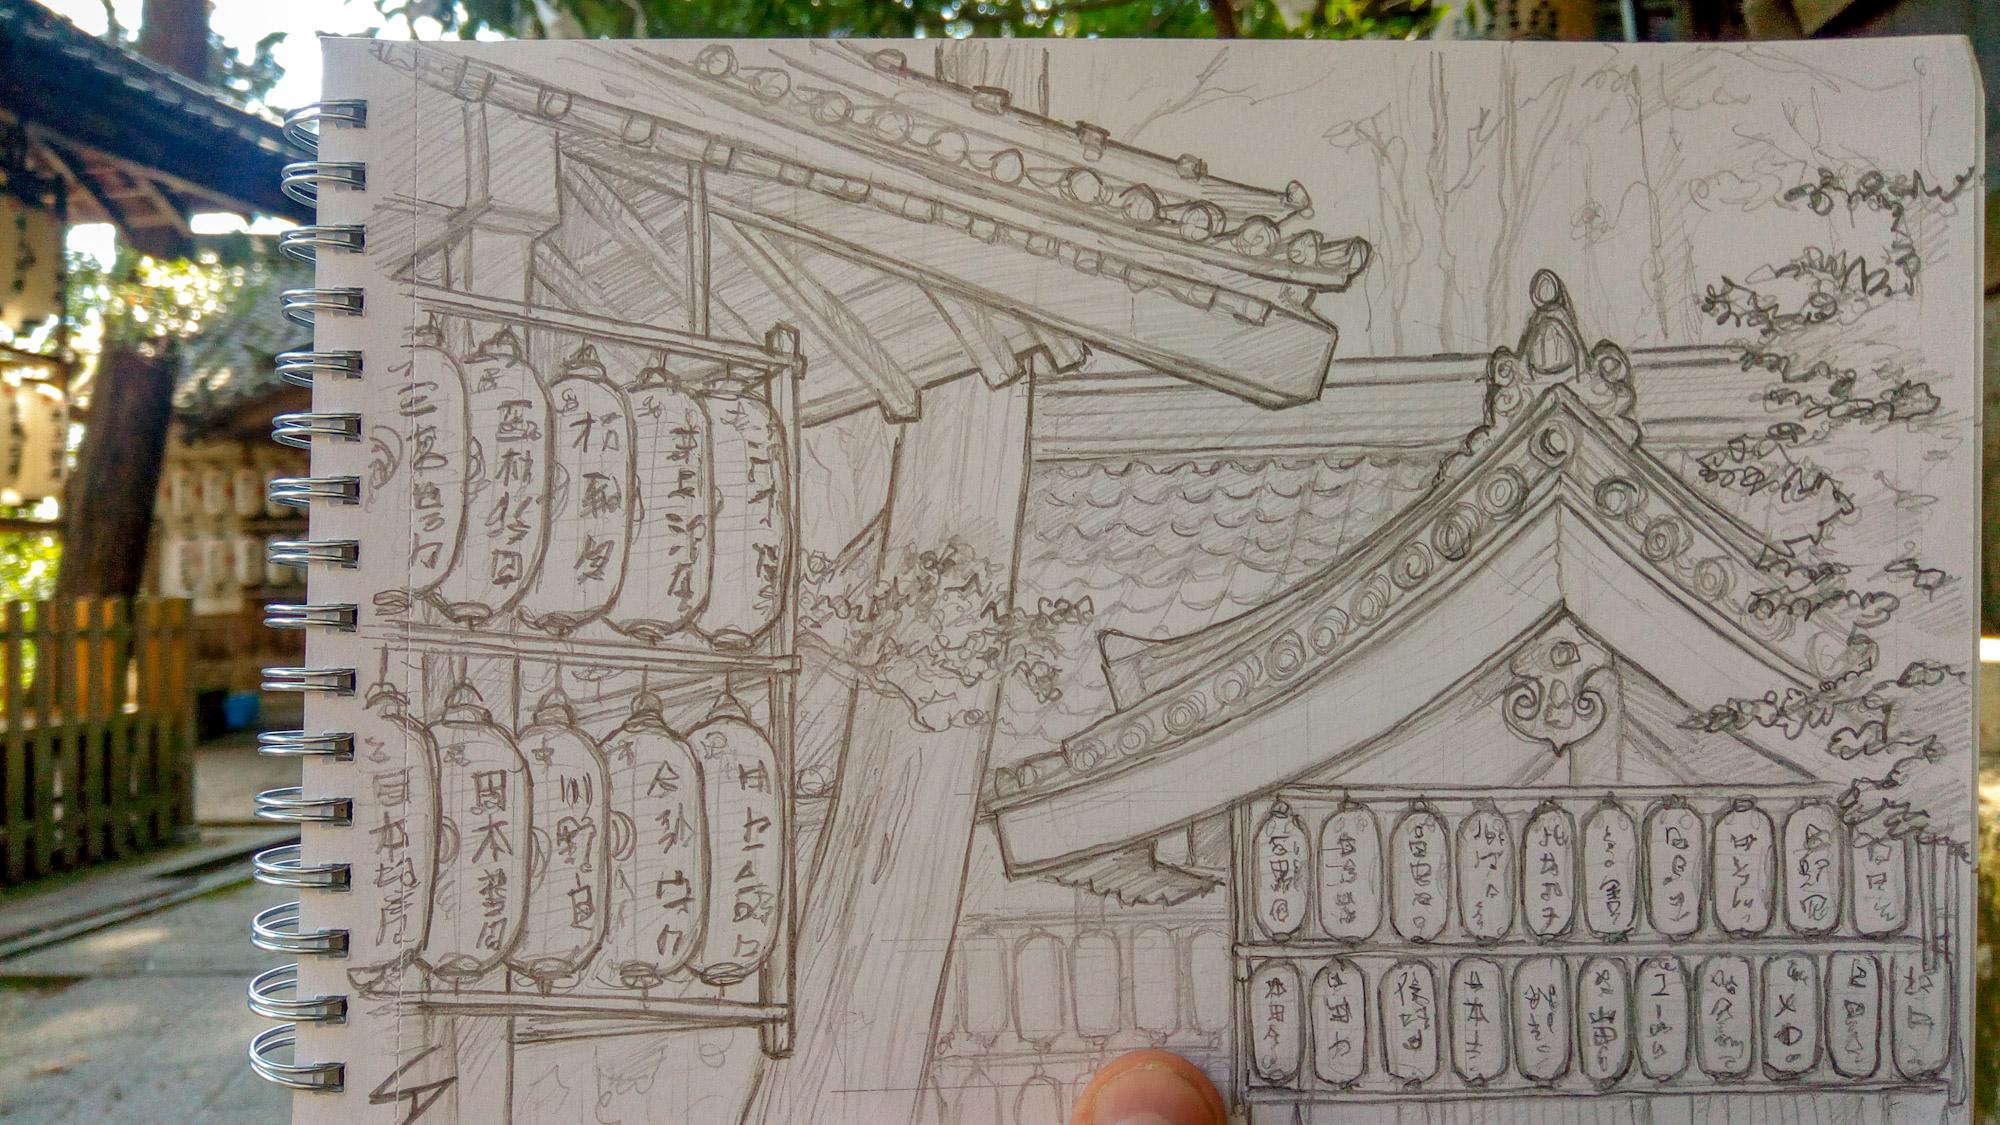 Urban photo art – Sakyo-Ku, Kyoto, Japan. 'Yagami Shrine.' Artwork from my latest travel art blog article 'Sakura Japan.' Now online - sketchbookexplorer.com @davidasutton @sketchbookexplorer Facebook.com/davidanthonysutton #sketch #drawing #art #japan #Kyoto #yagamishrine #shinto #samurai #travel #travelblog #cherryblossom #cherryblossomseason #cherryblossomjapan